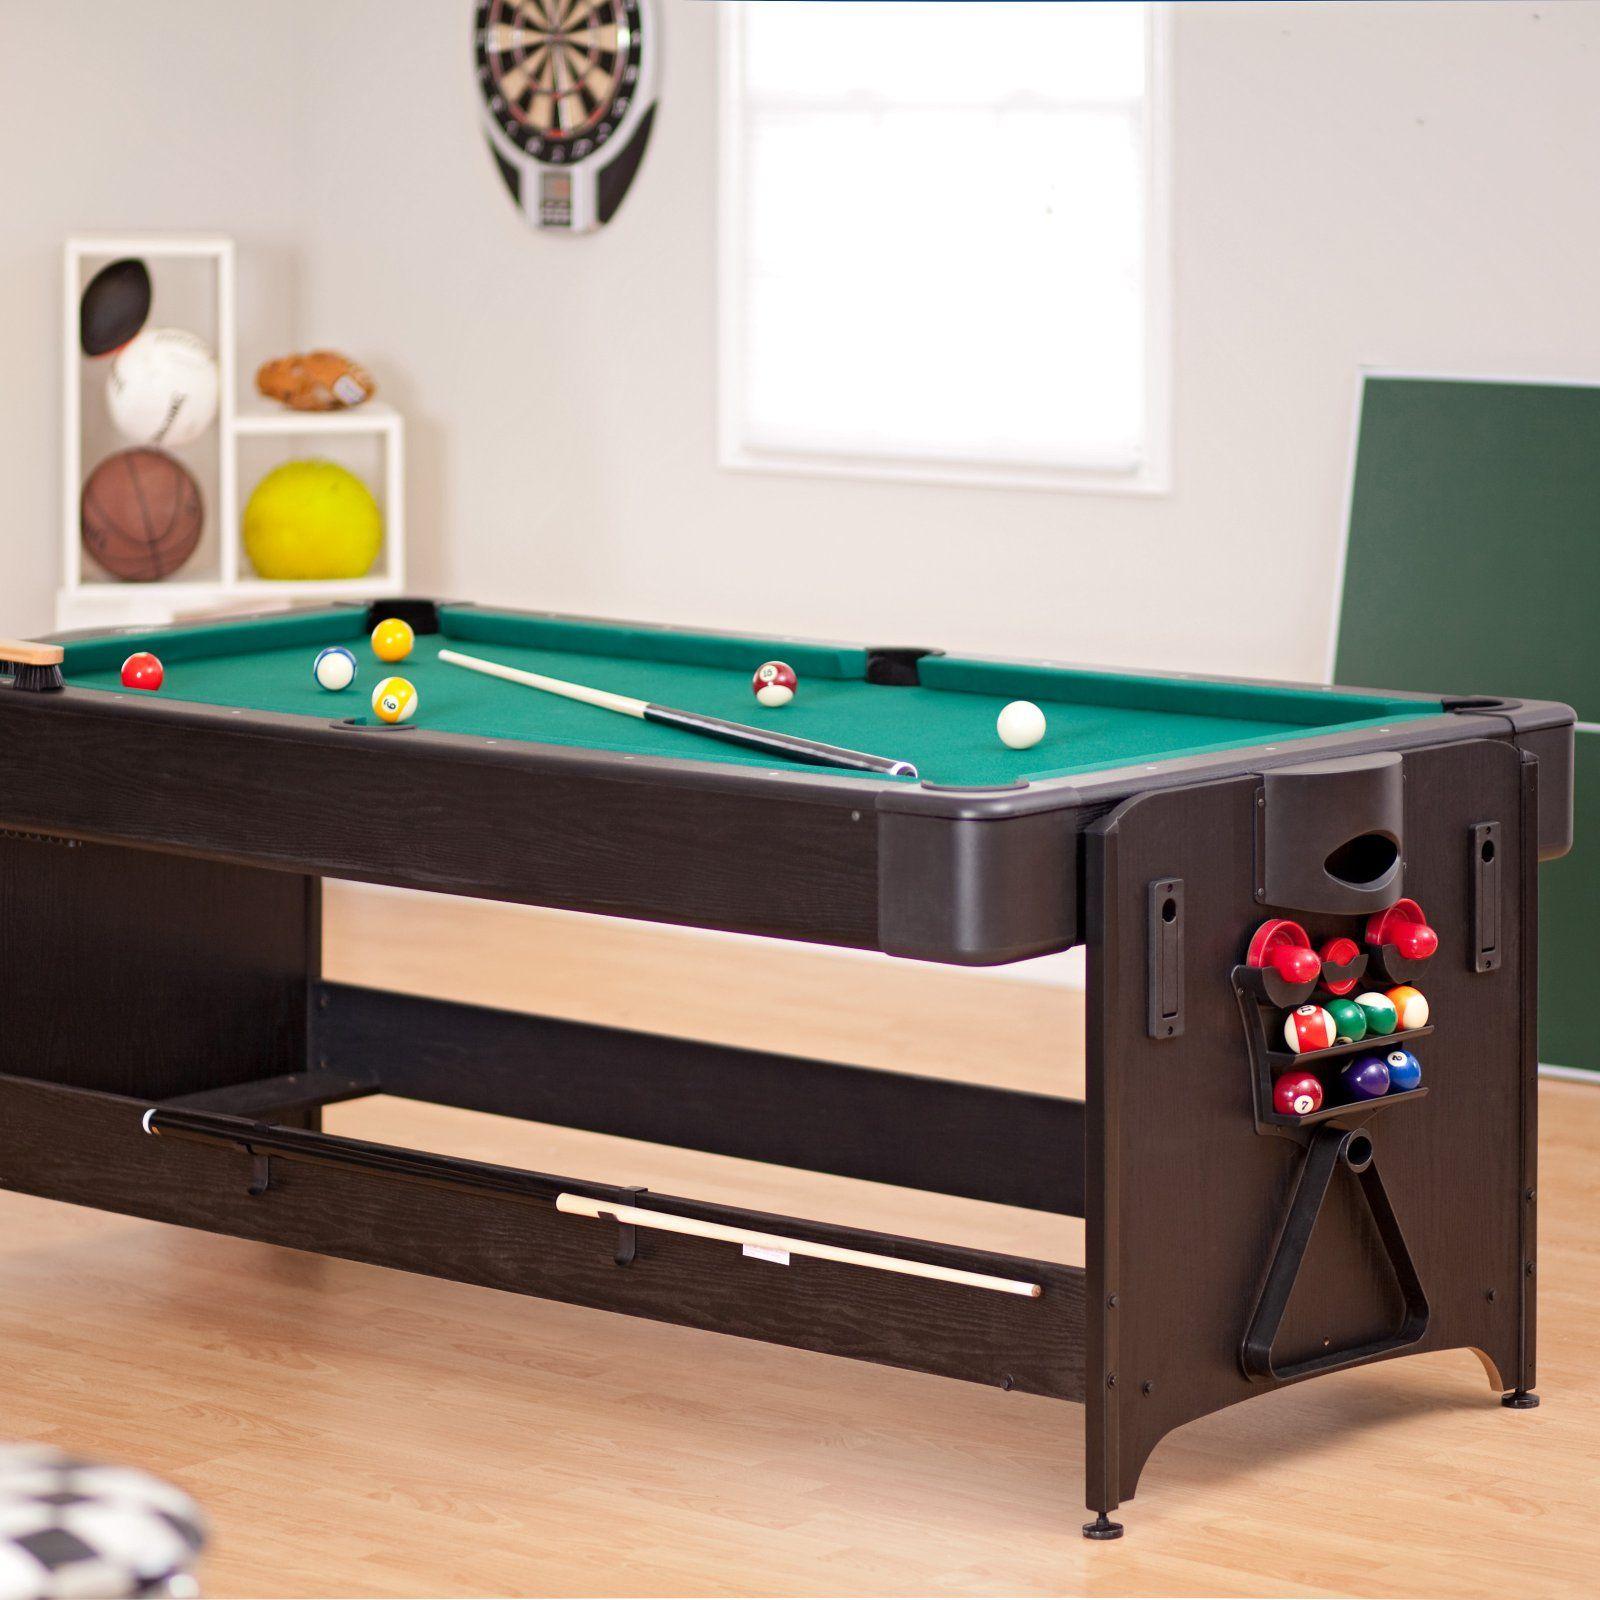 Air Hockey, Pool, Table Tennis. Basement